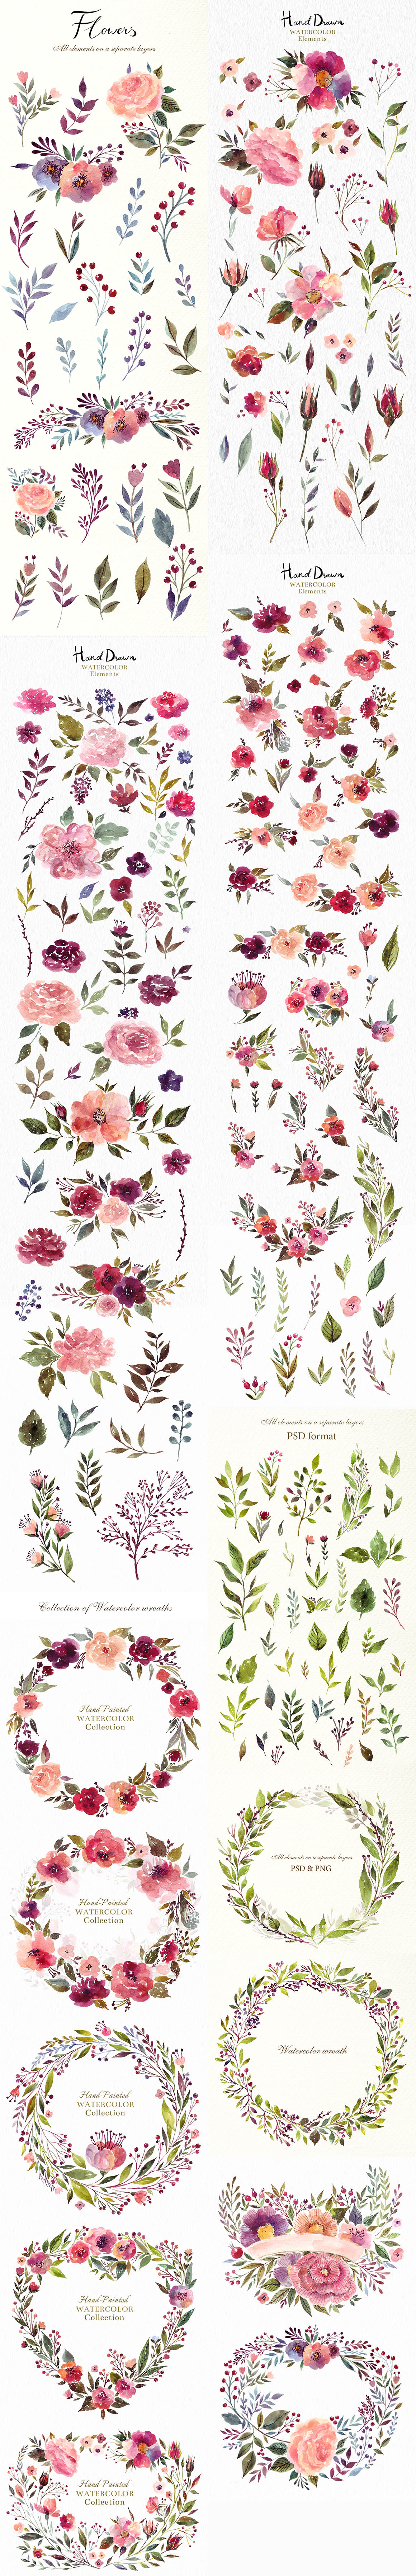 230 Watercolor graphic elements 2